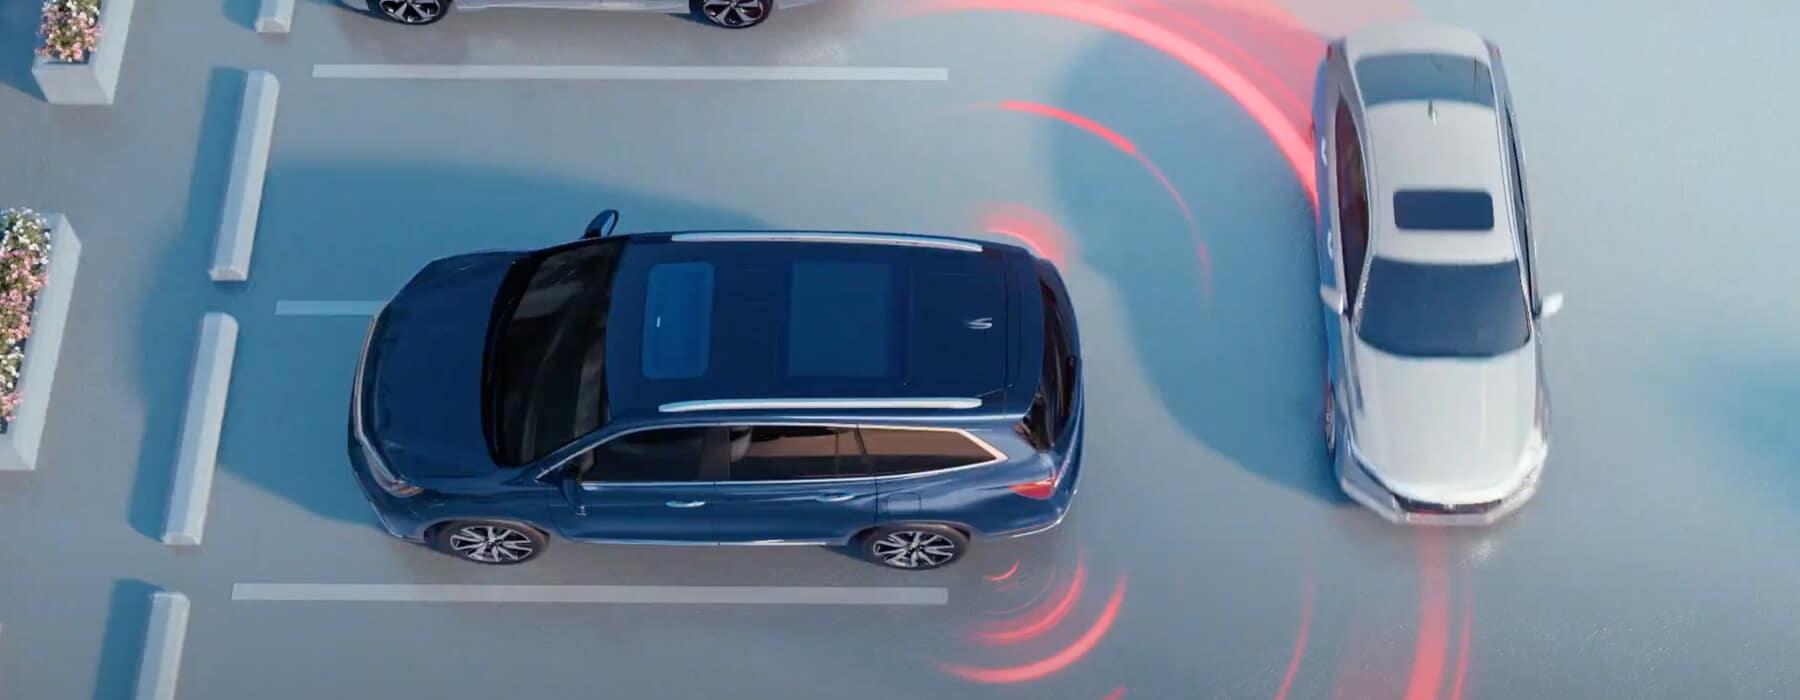 Honda Cross Traffic Monitor VEHSC Slider